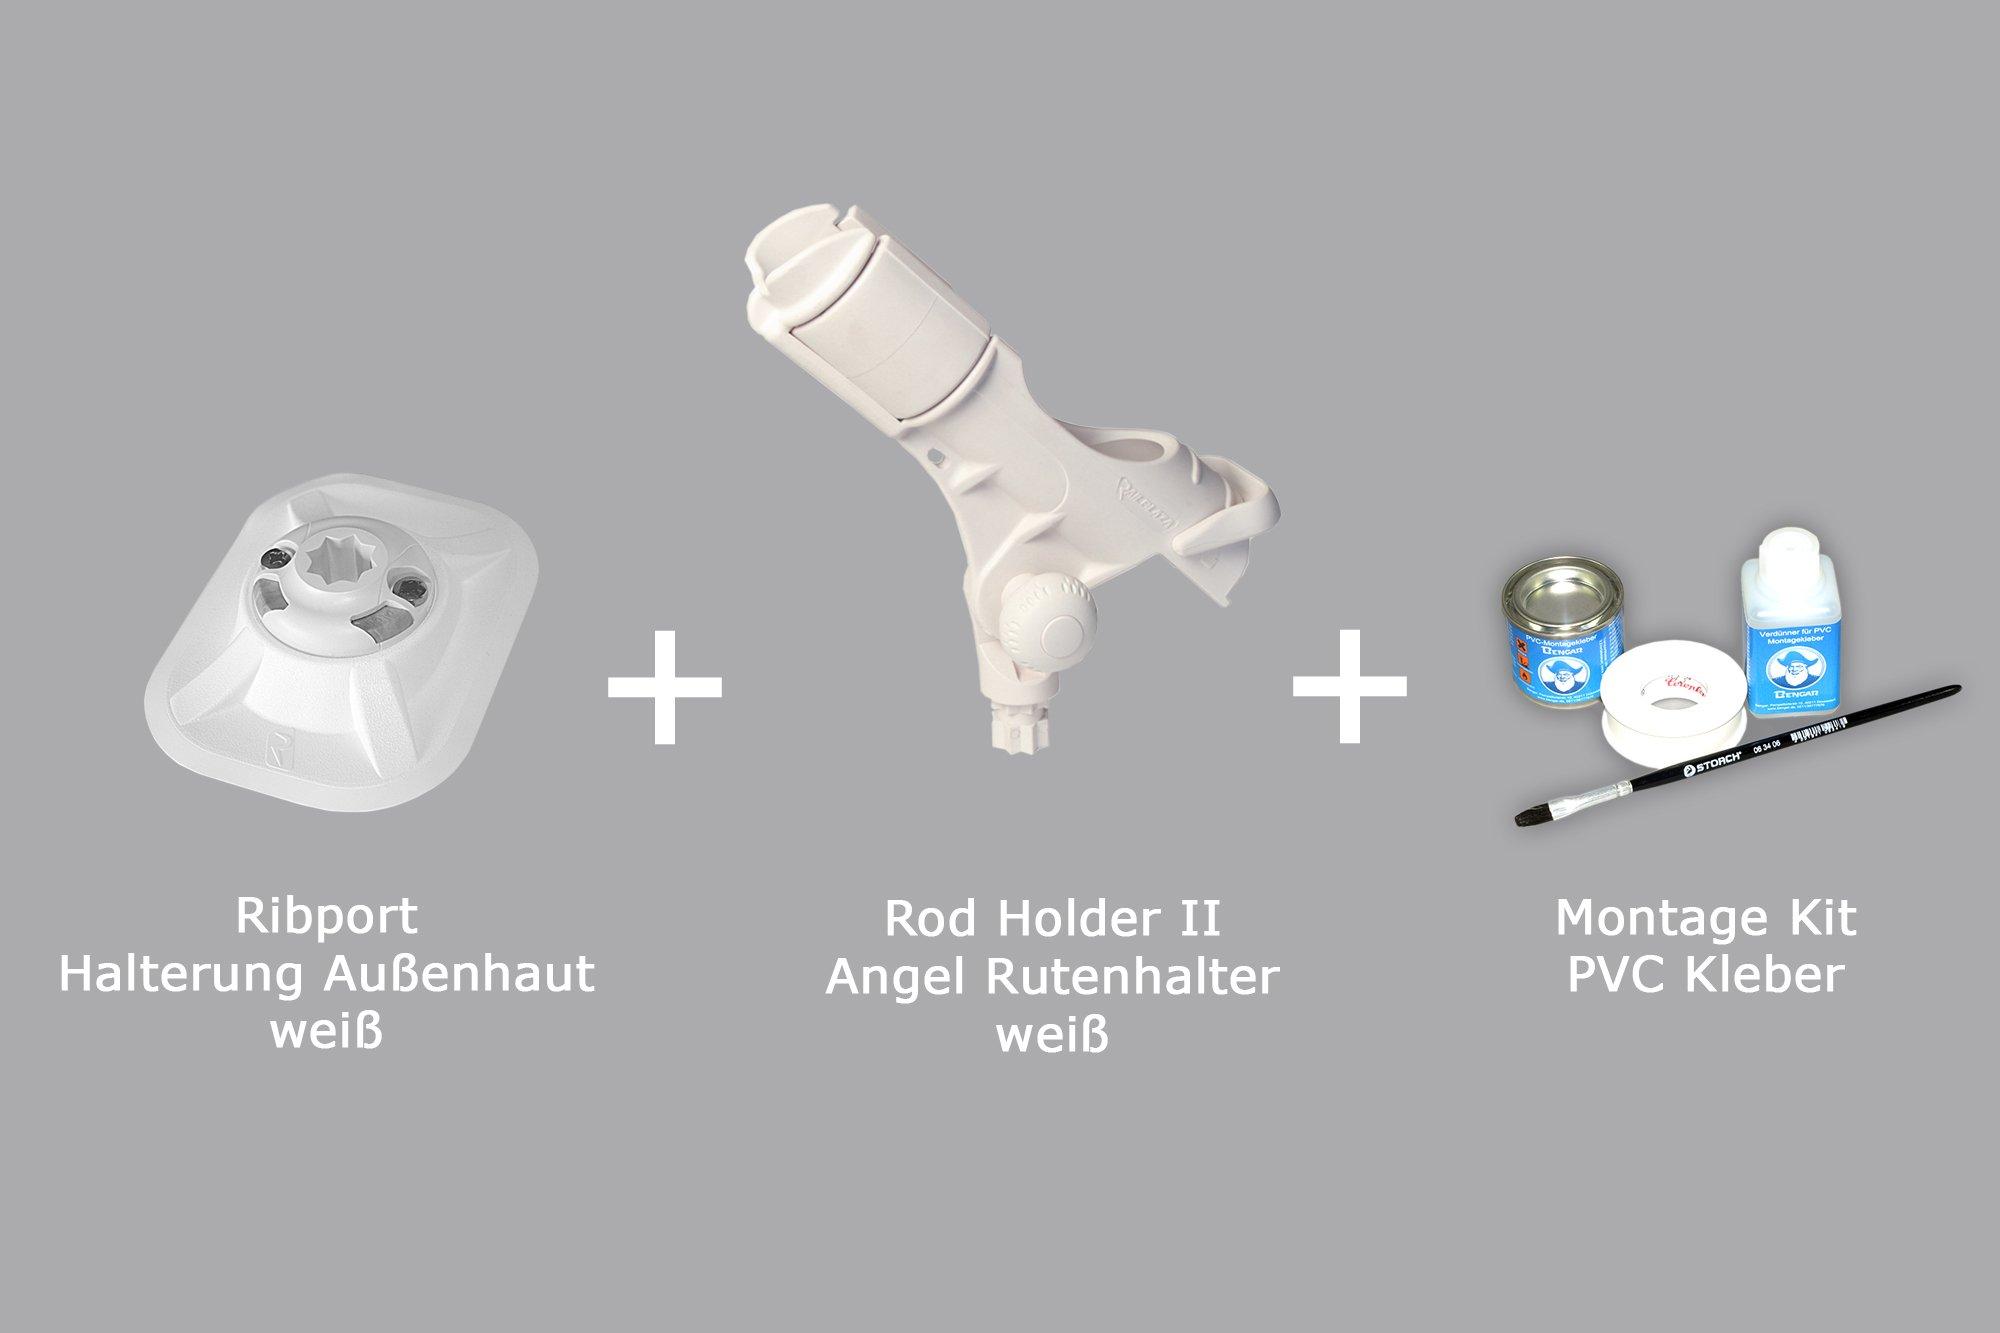 Railblaza Rutenh 03-0008-11 Set: Rod Holder II Kleber Kit, wei/ß Ribport